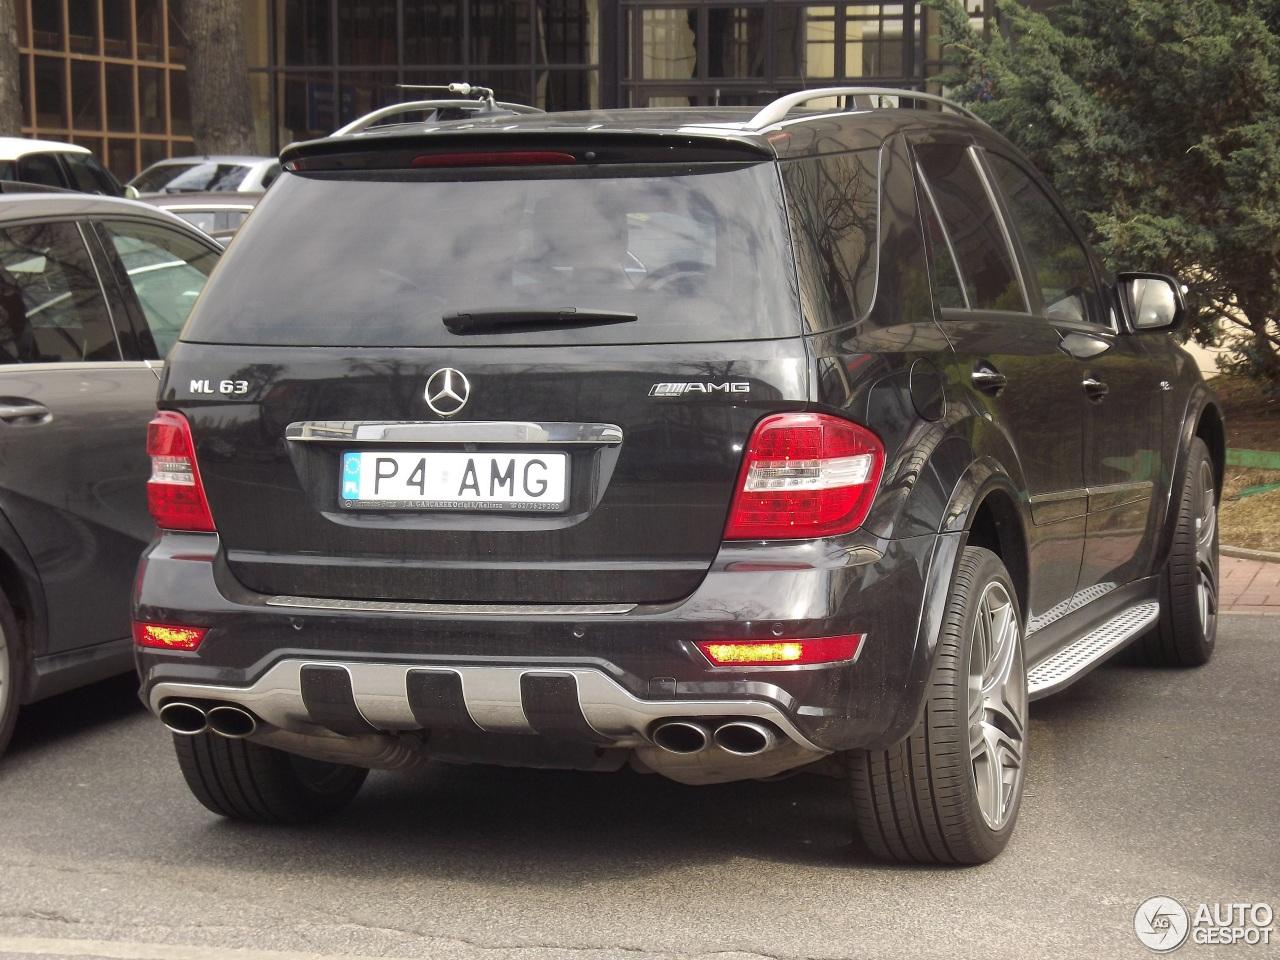 Mercedes benz ml 63 amg w164 2009 30 2014 autogespot for Mercedes benz w164